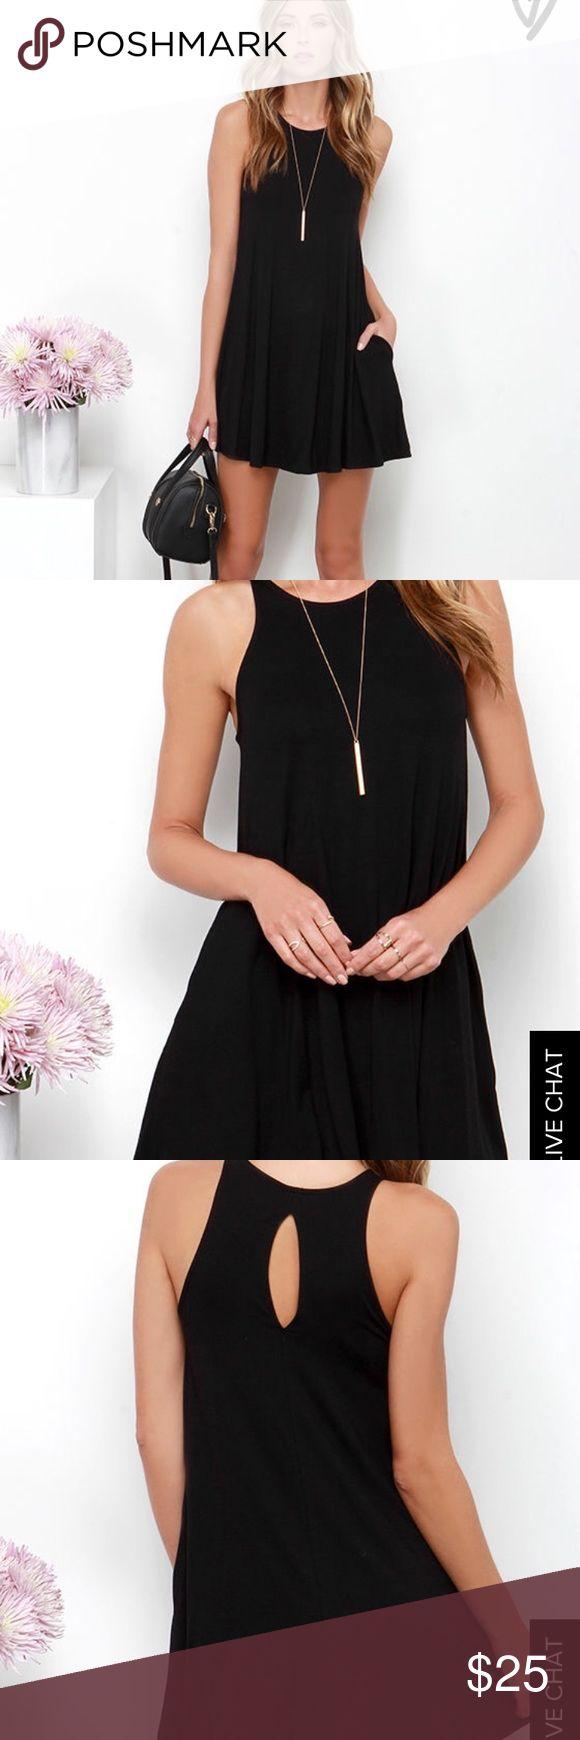 Tupelo honey black dress Black shift dress. Perfect for any occasion. Key hole back Lulu's Dresses